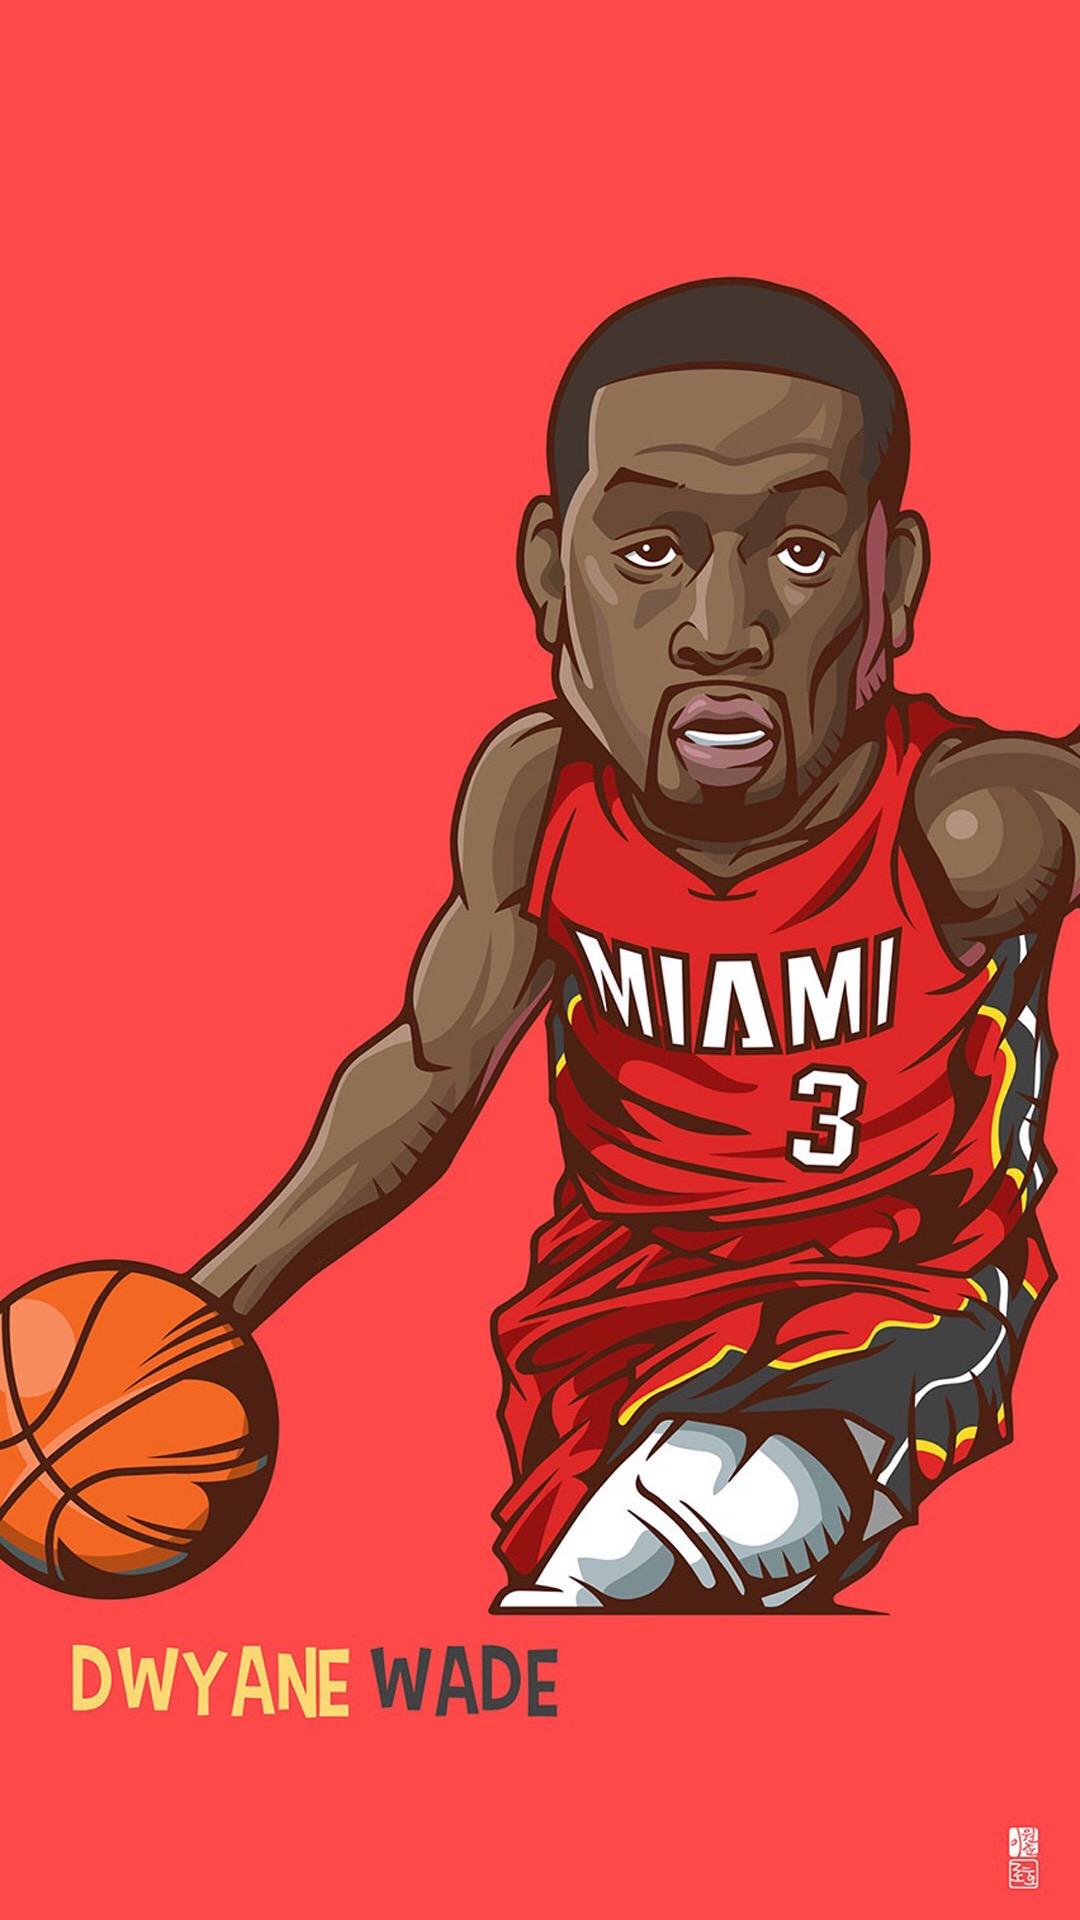 Download-Dwyane-Wade-1080-x-1920-nba-miamiheat-basketball-wade-mobile-wallpaper-wpc5804284